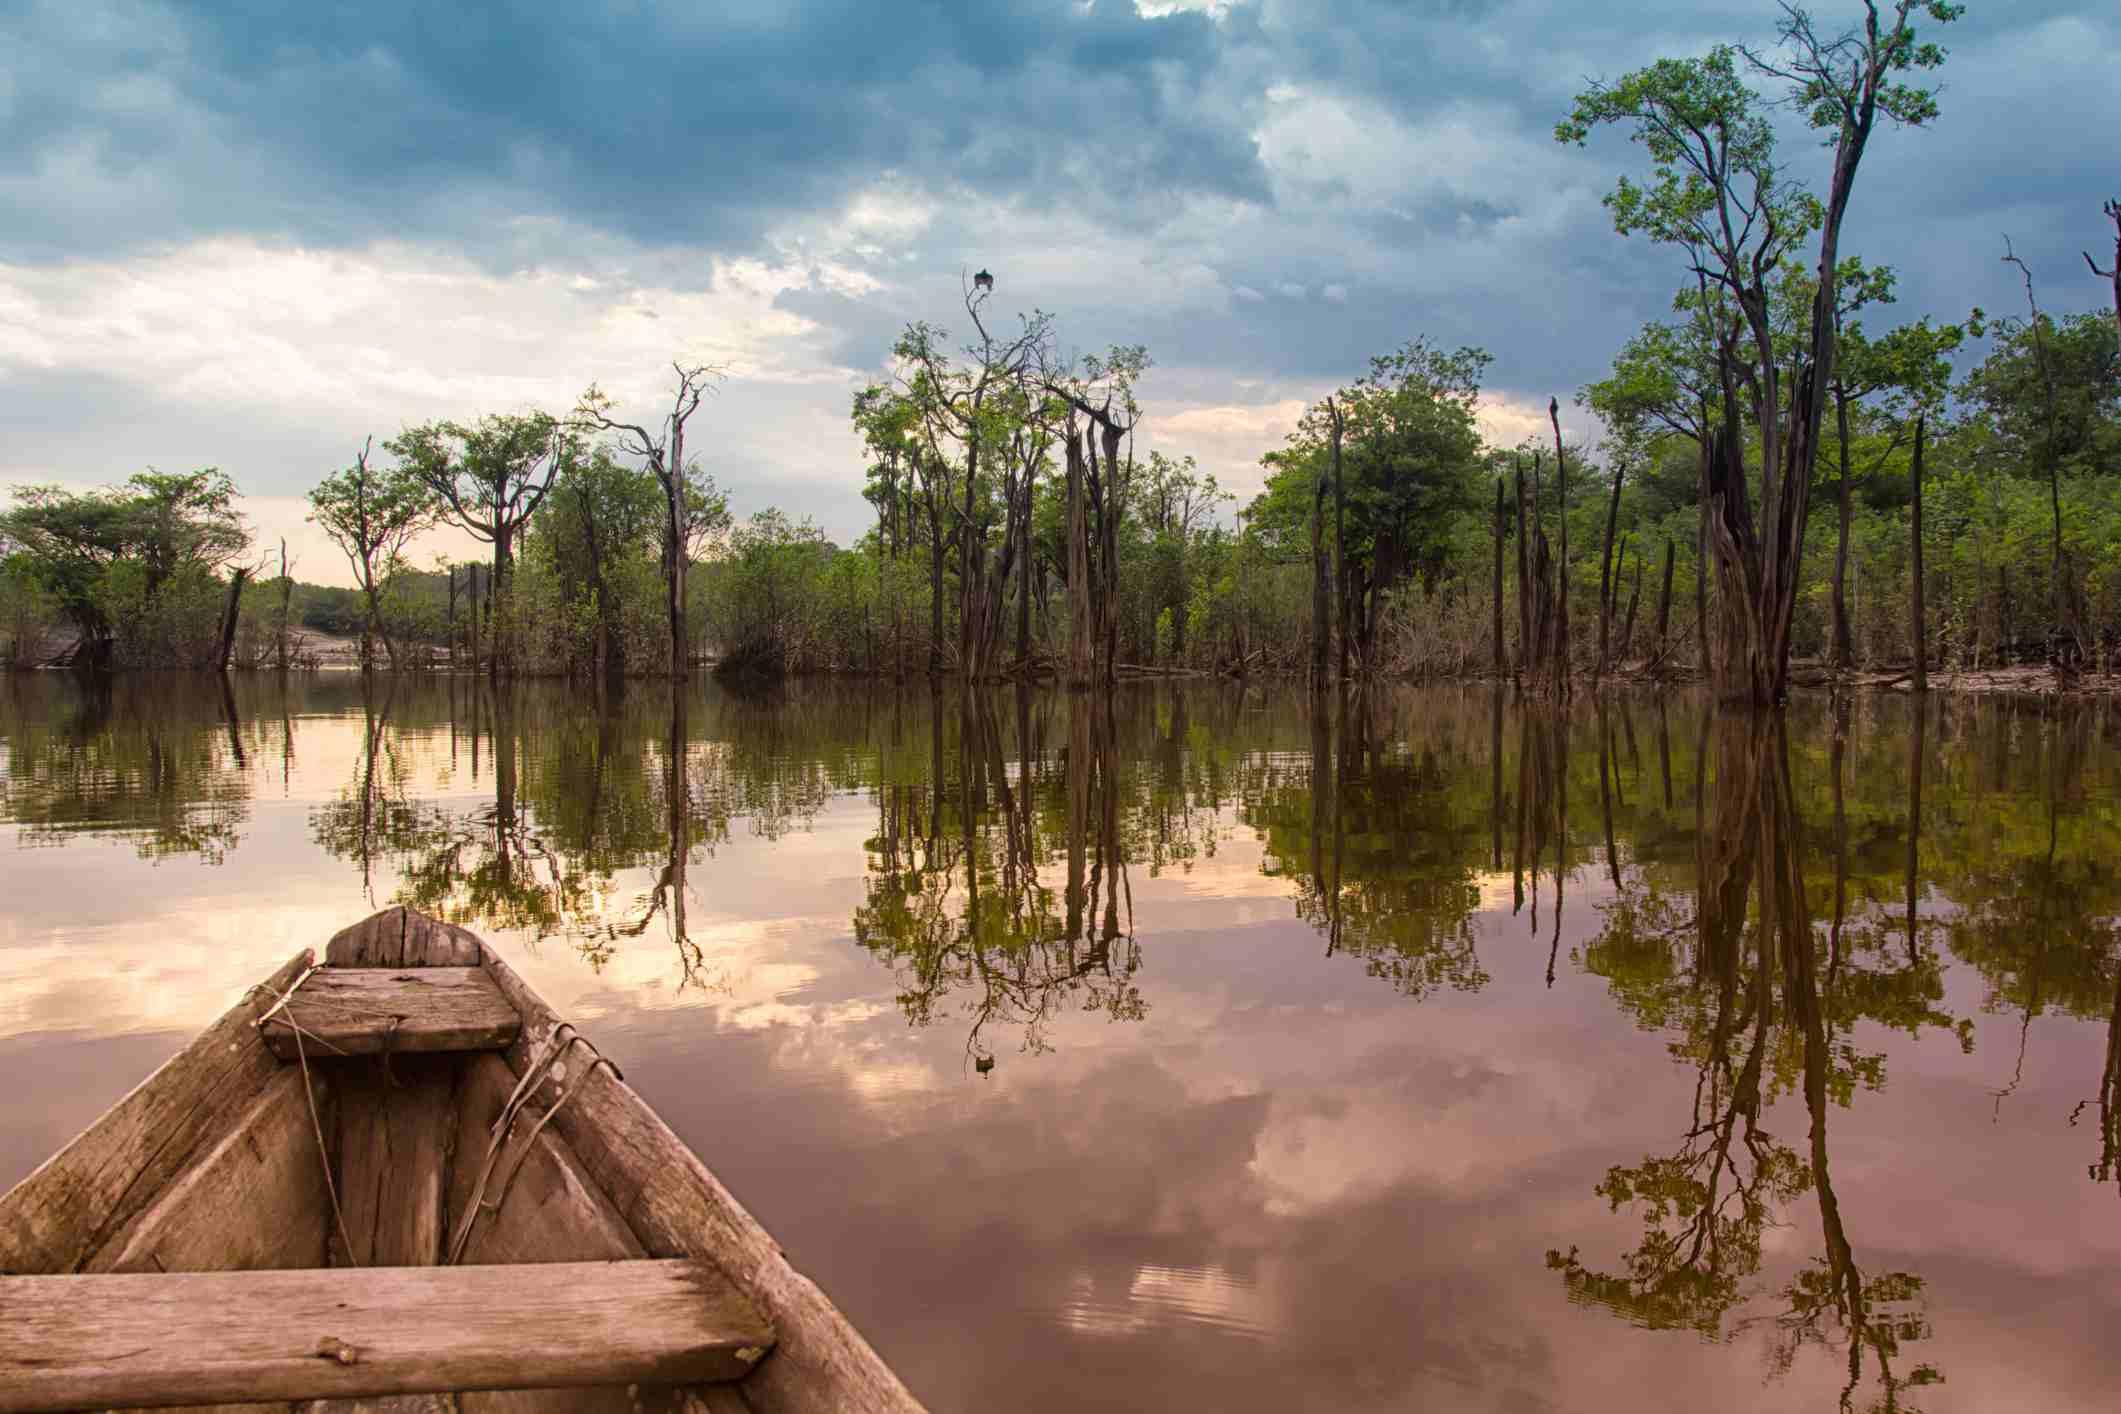 Sailing in the Amazon jungle.